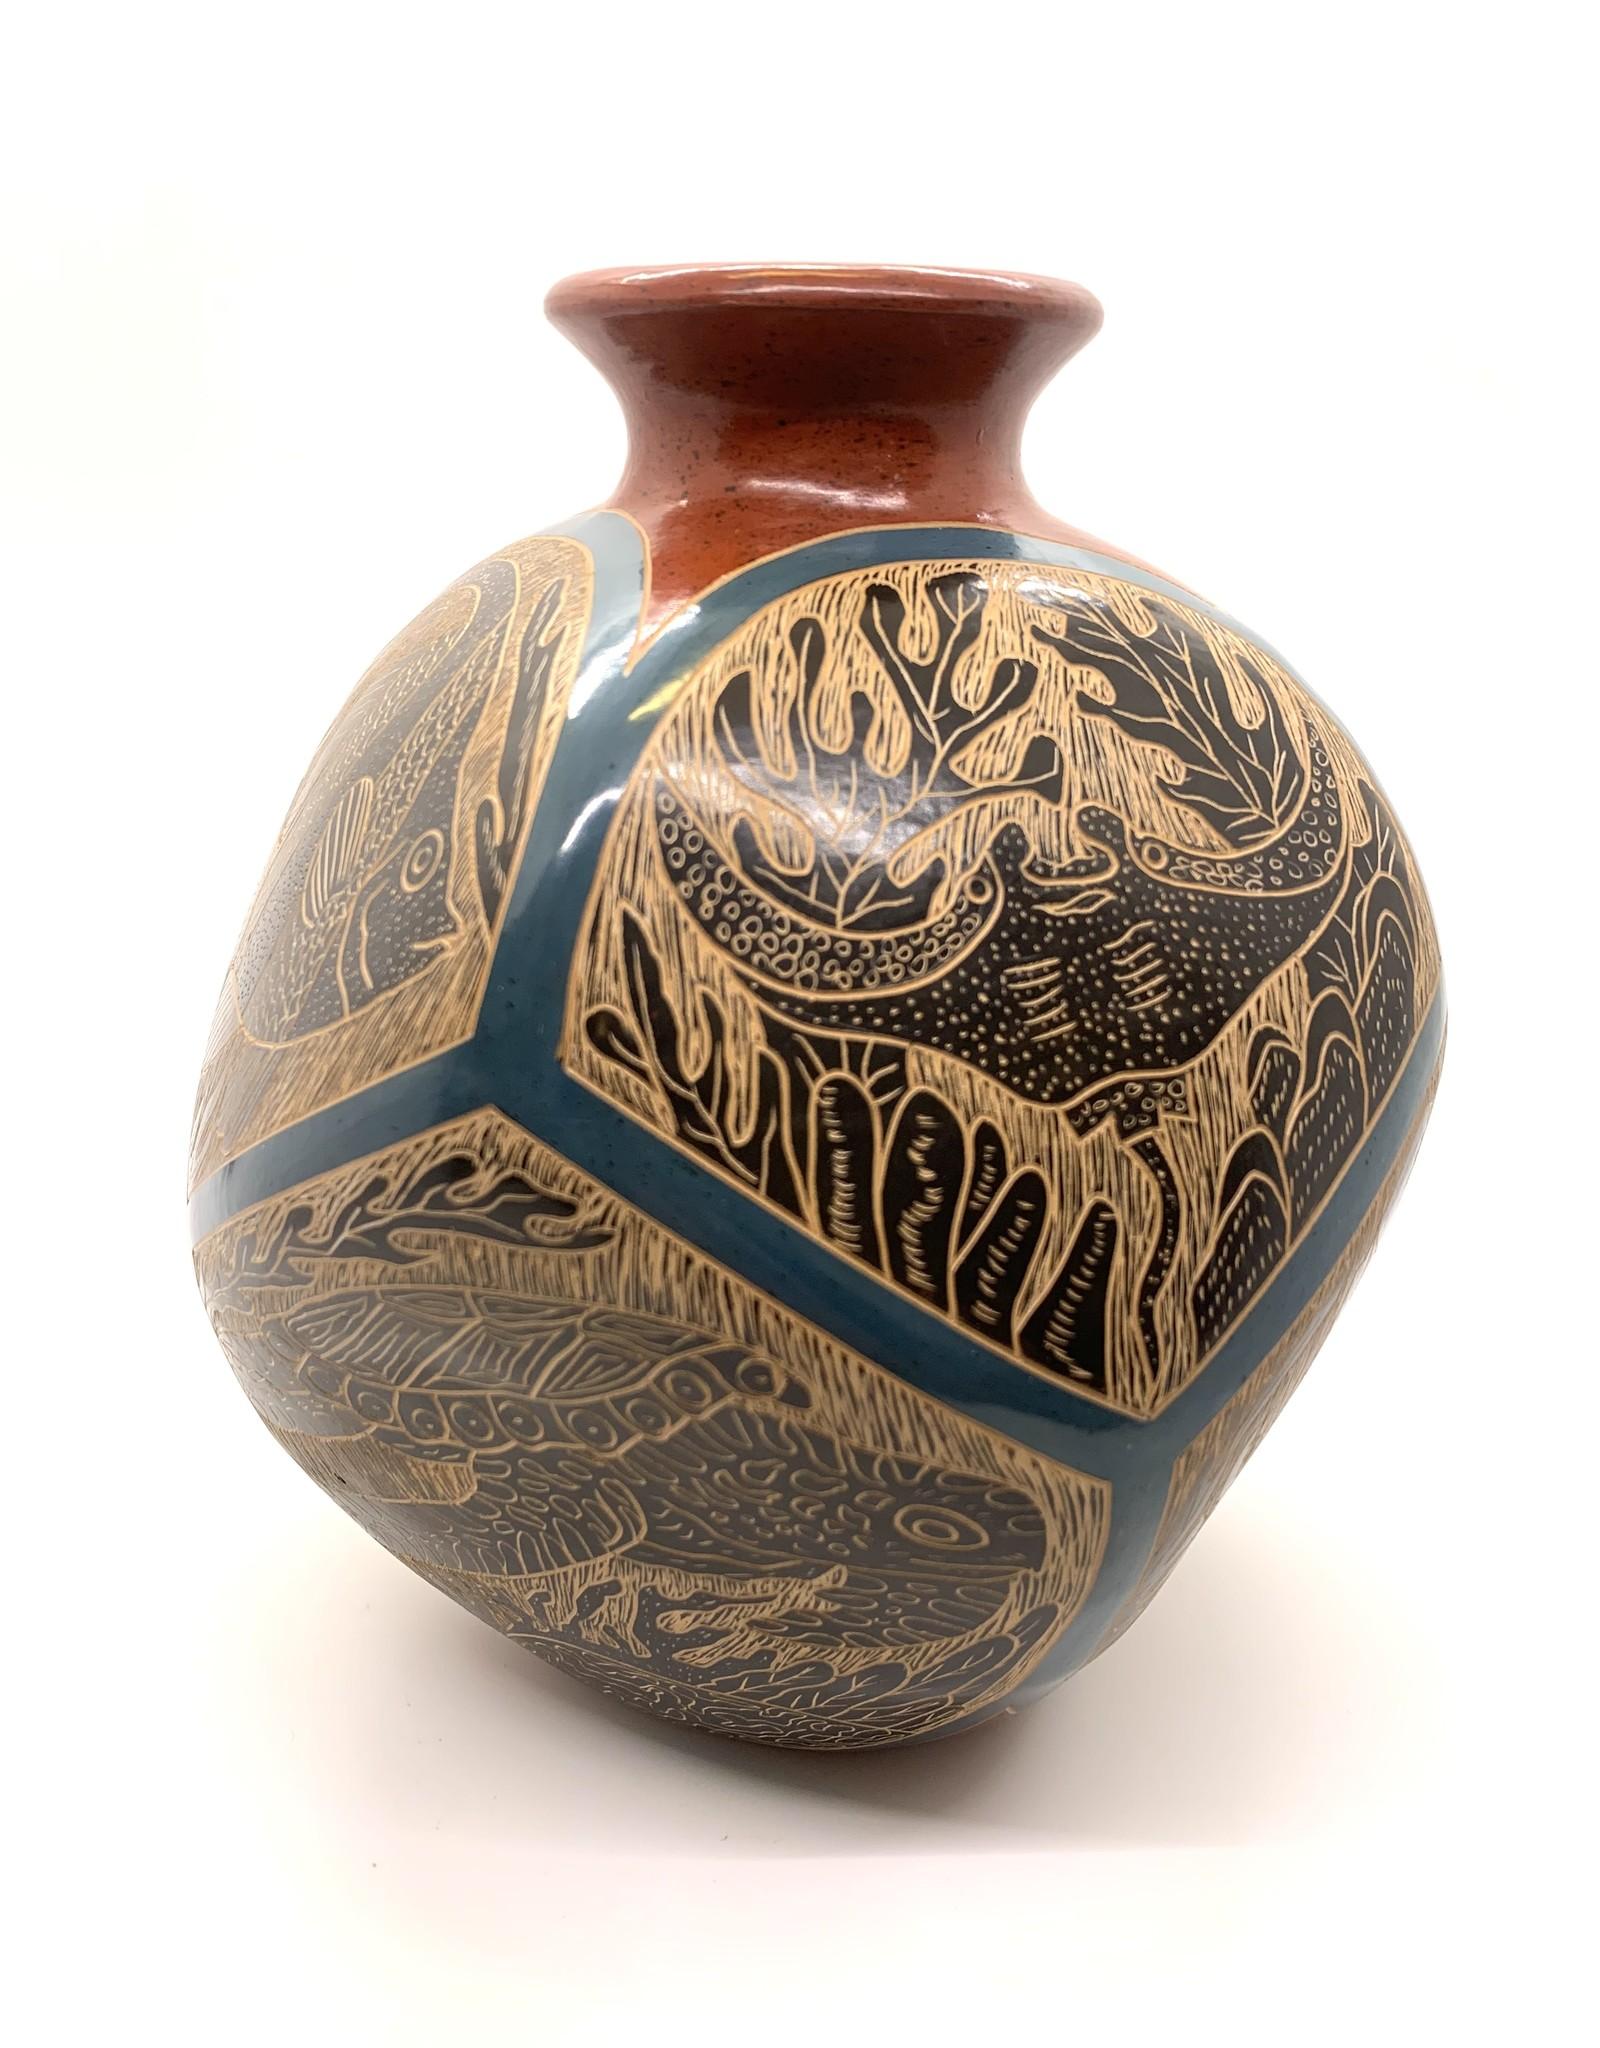 Geometric Sea Creature Vase